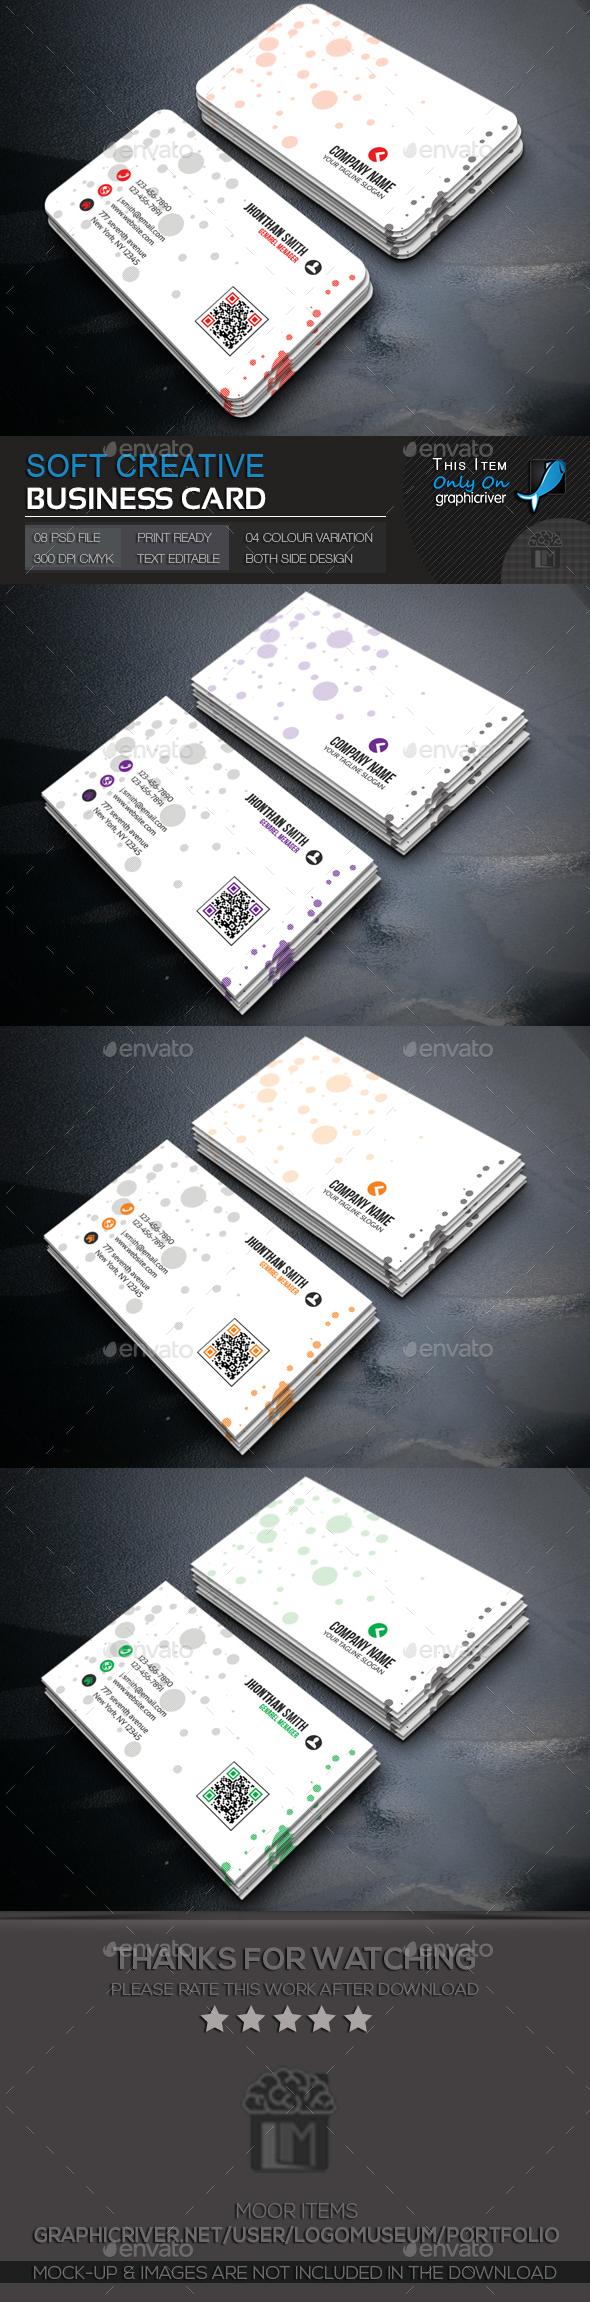 Soft Creative Business Card - Creative Business Cards